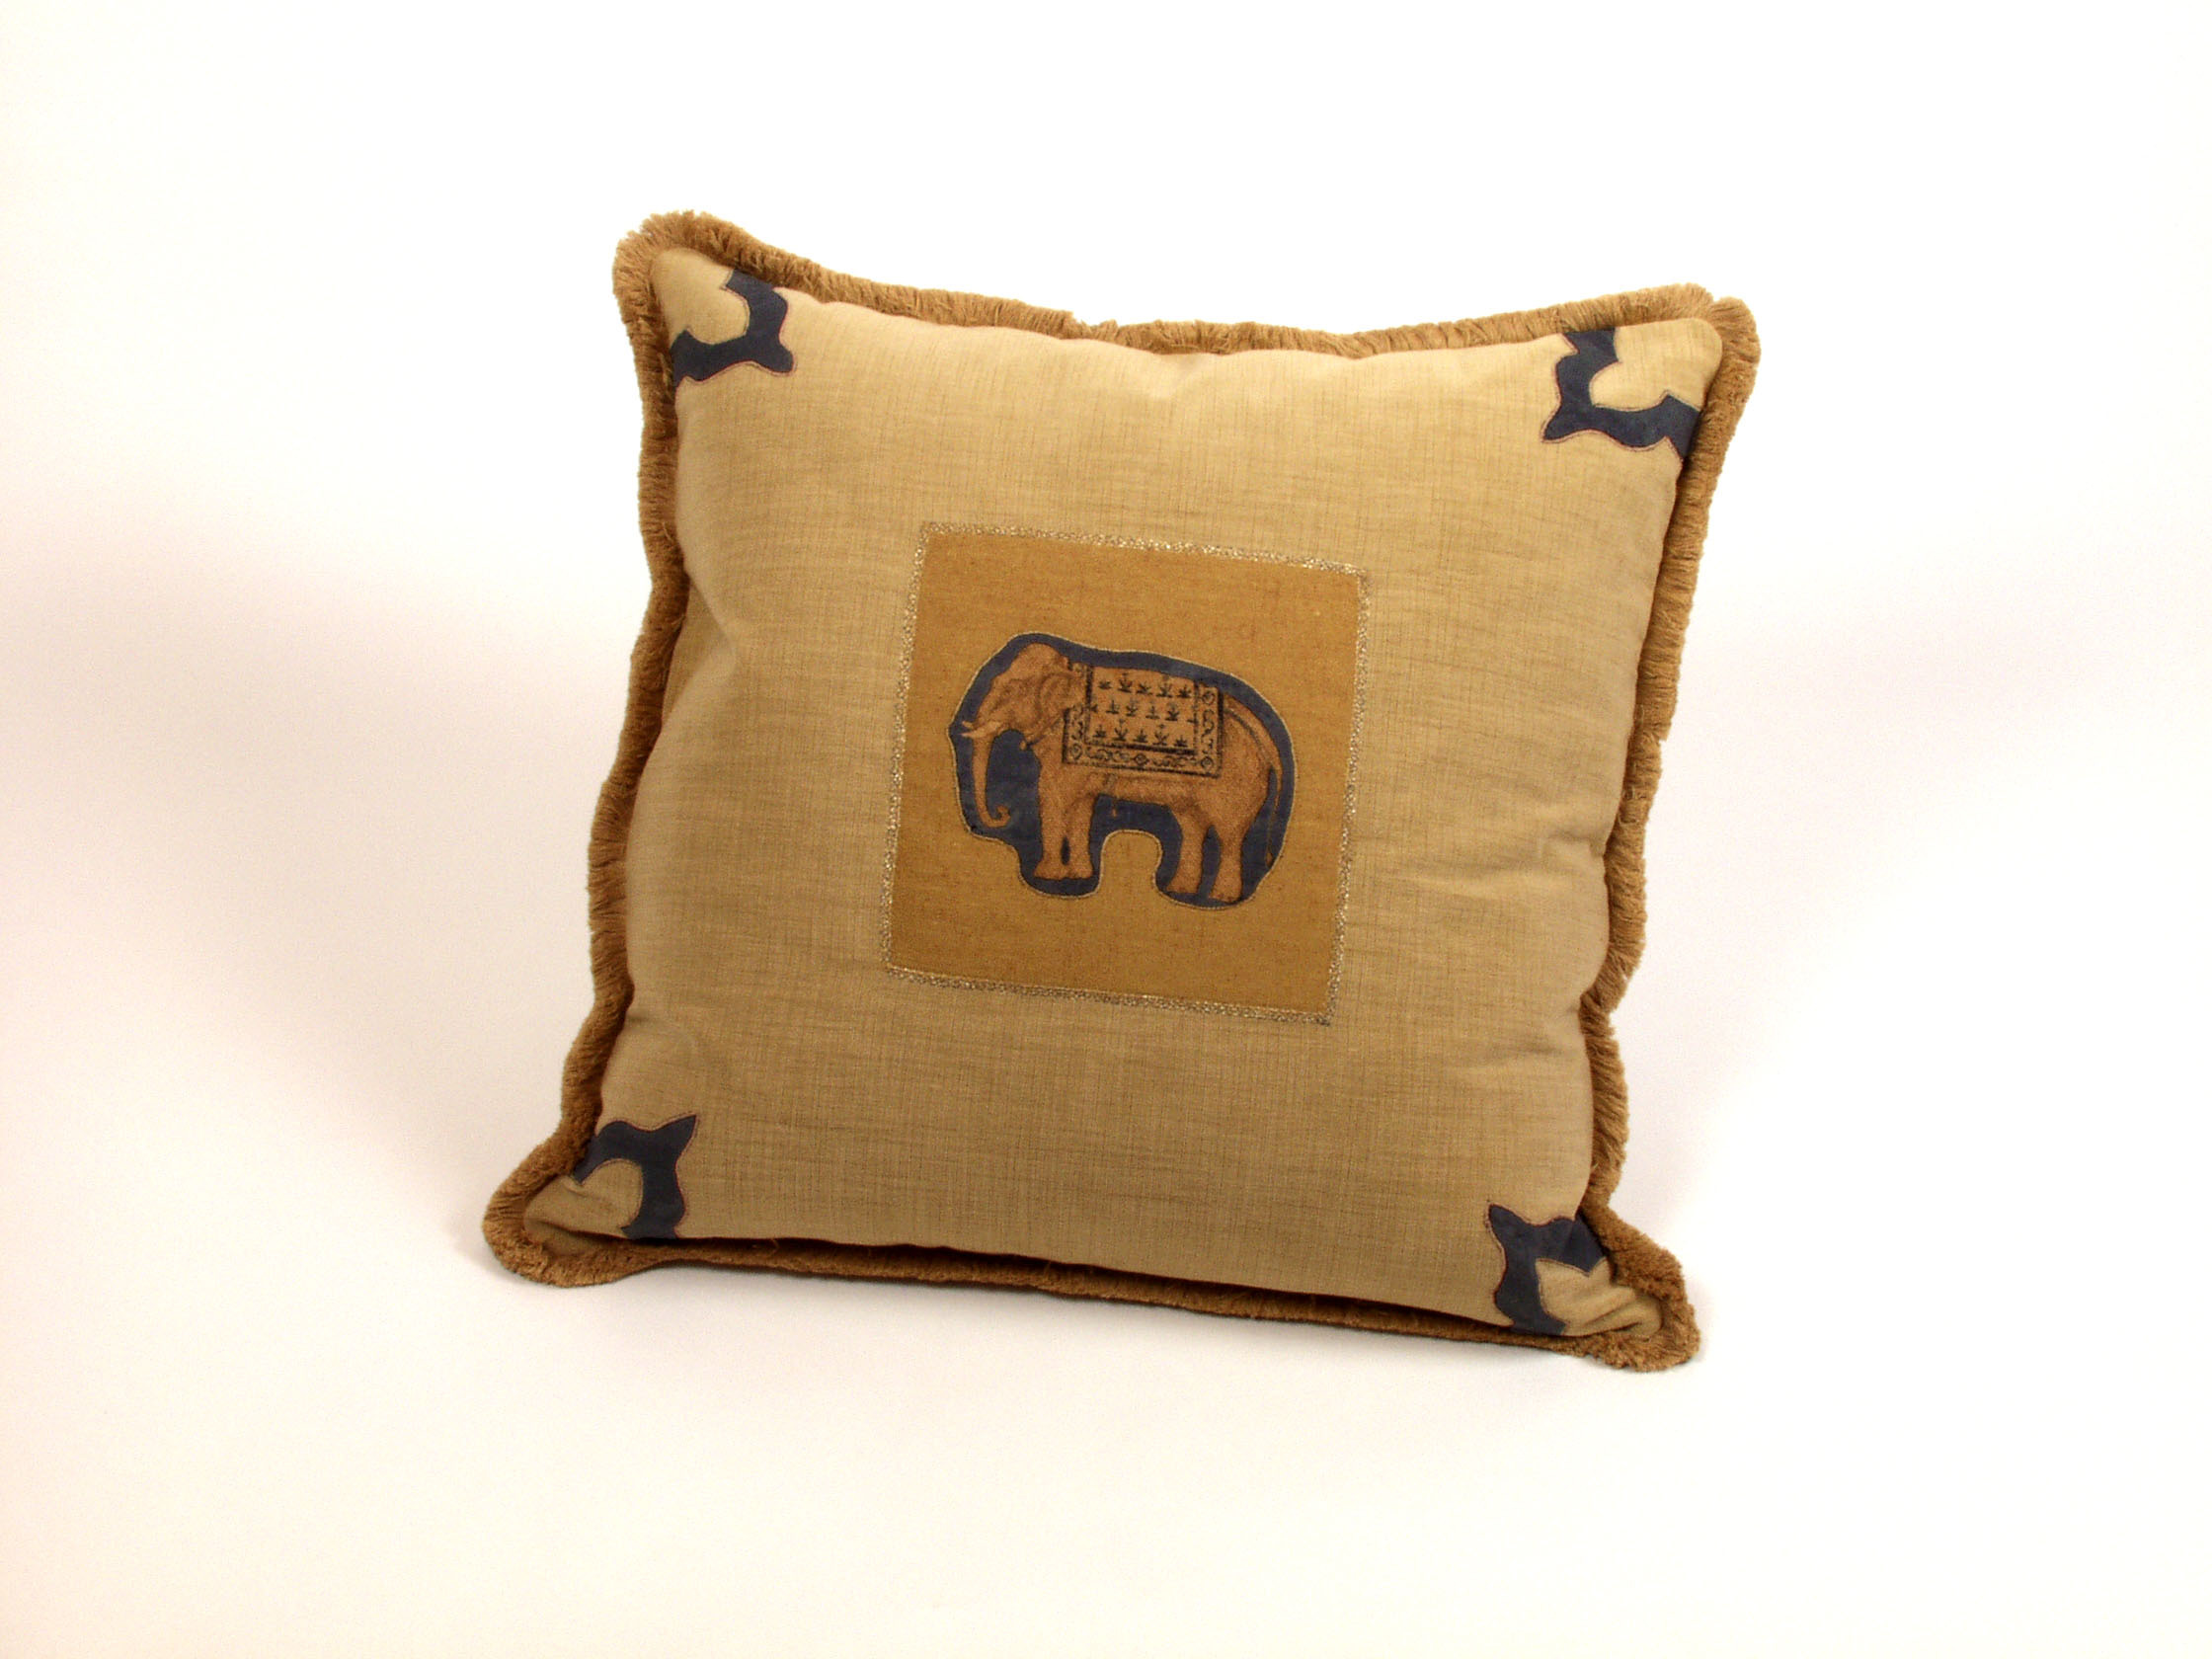 decorative cushions namast design. Black Bedroom Furniture Sets. Home Design Ideas